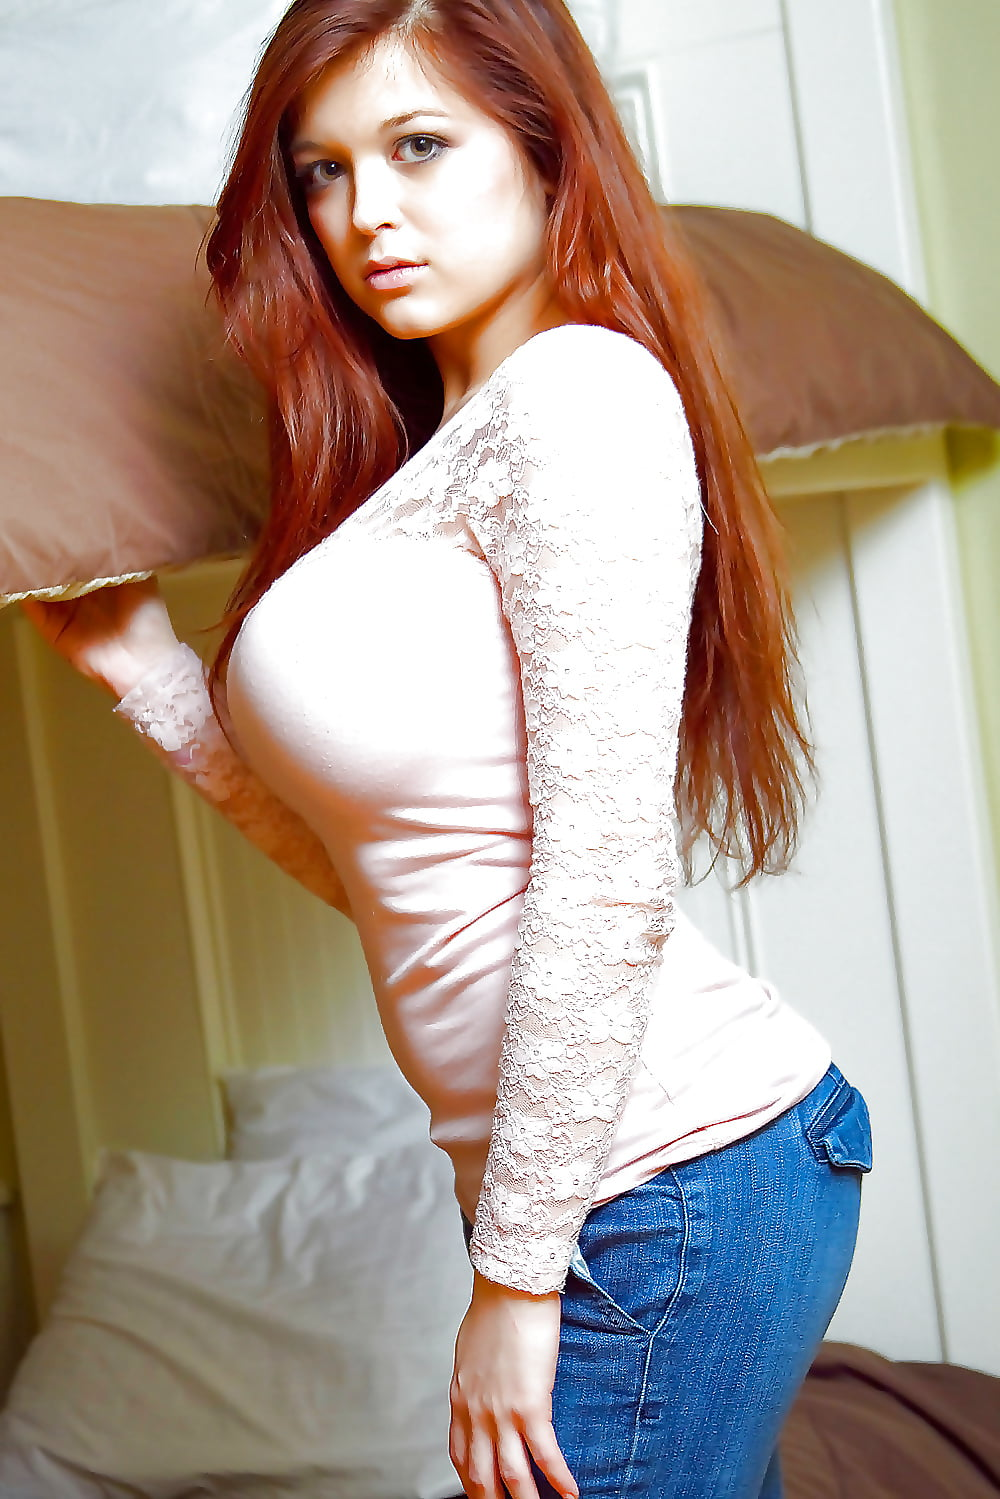 Big boob tight shirt pics — pic 5